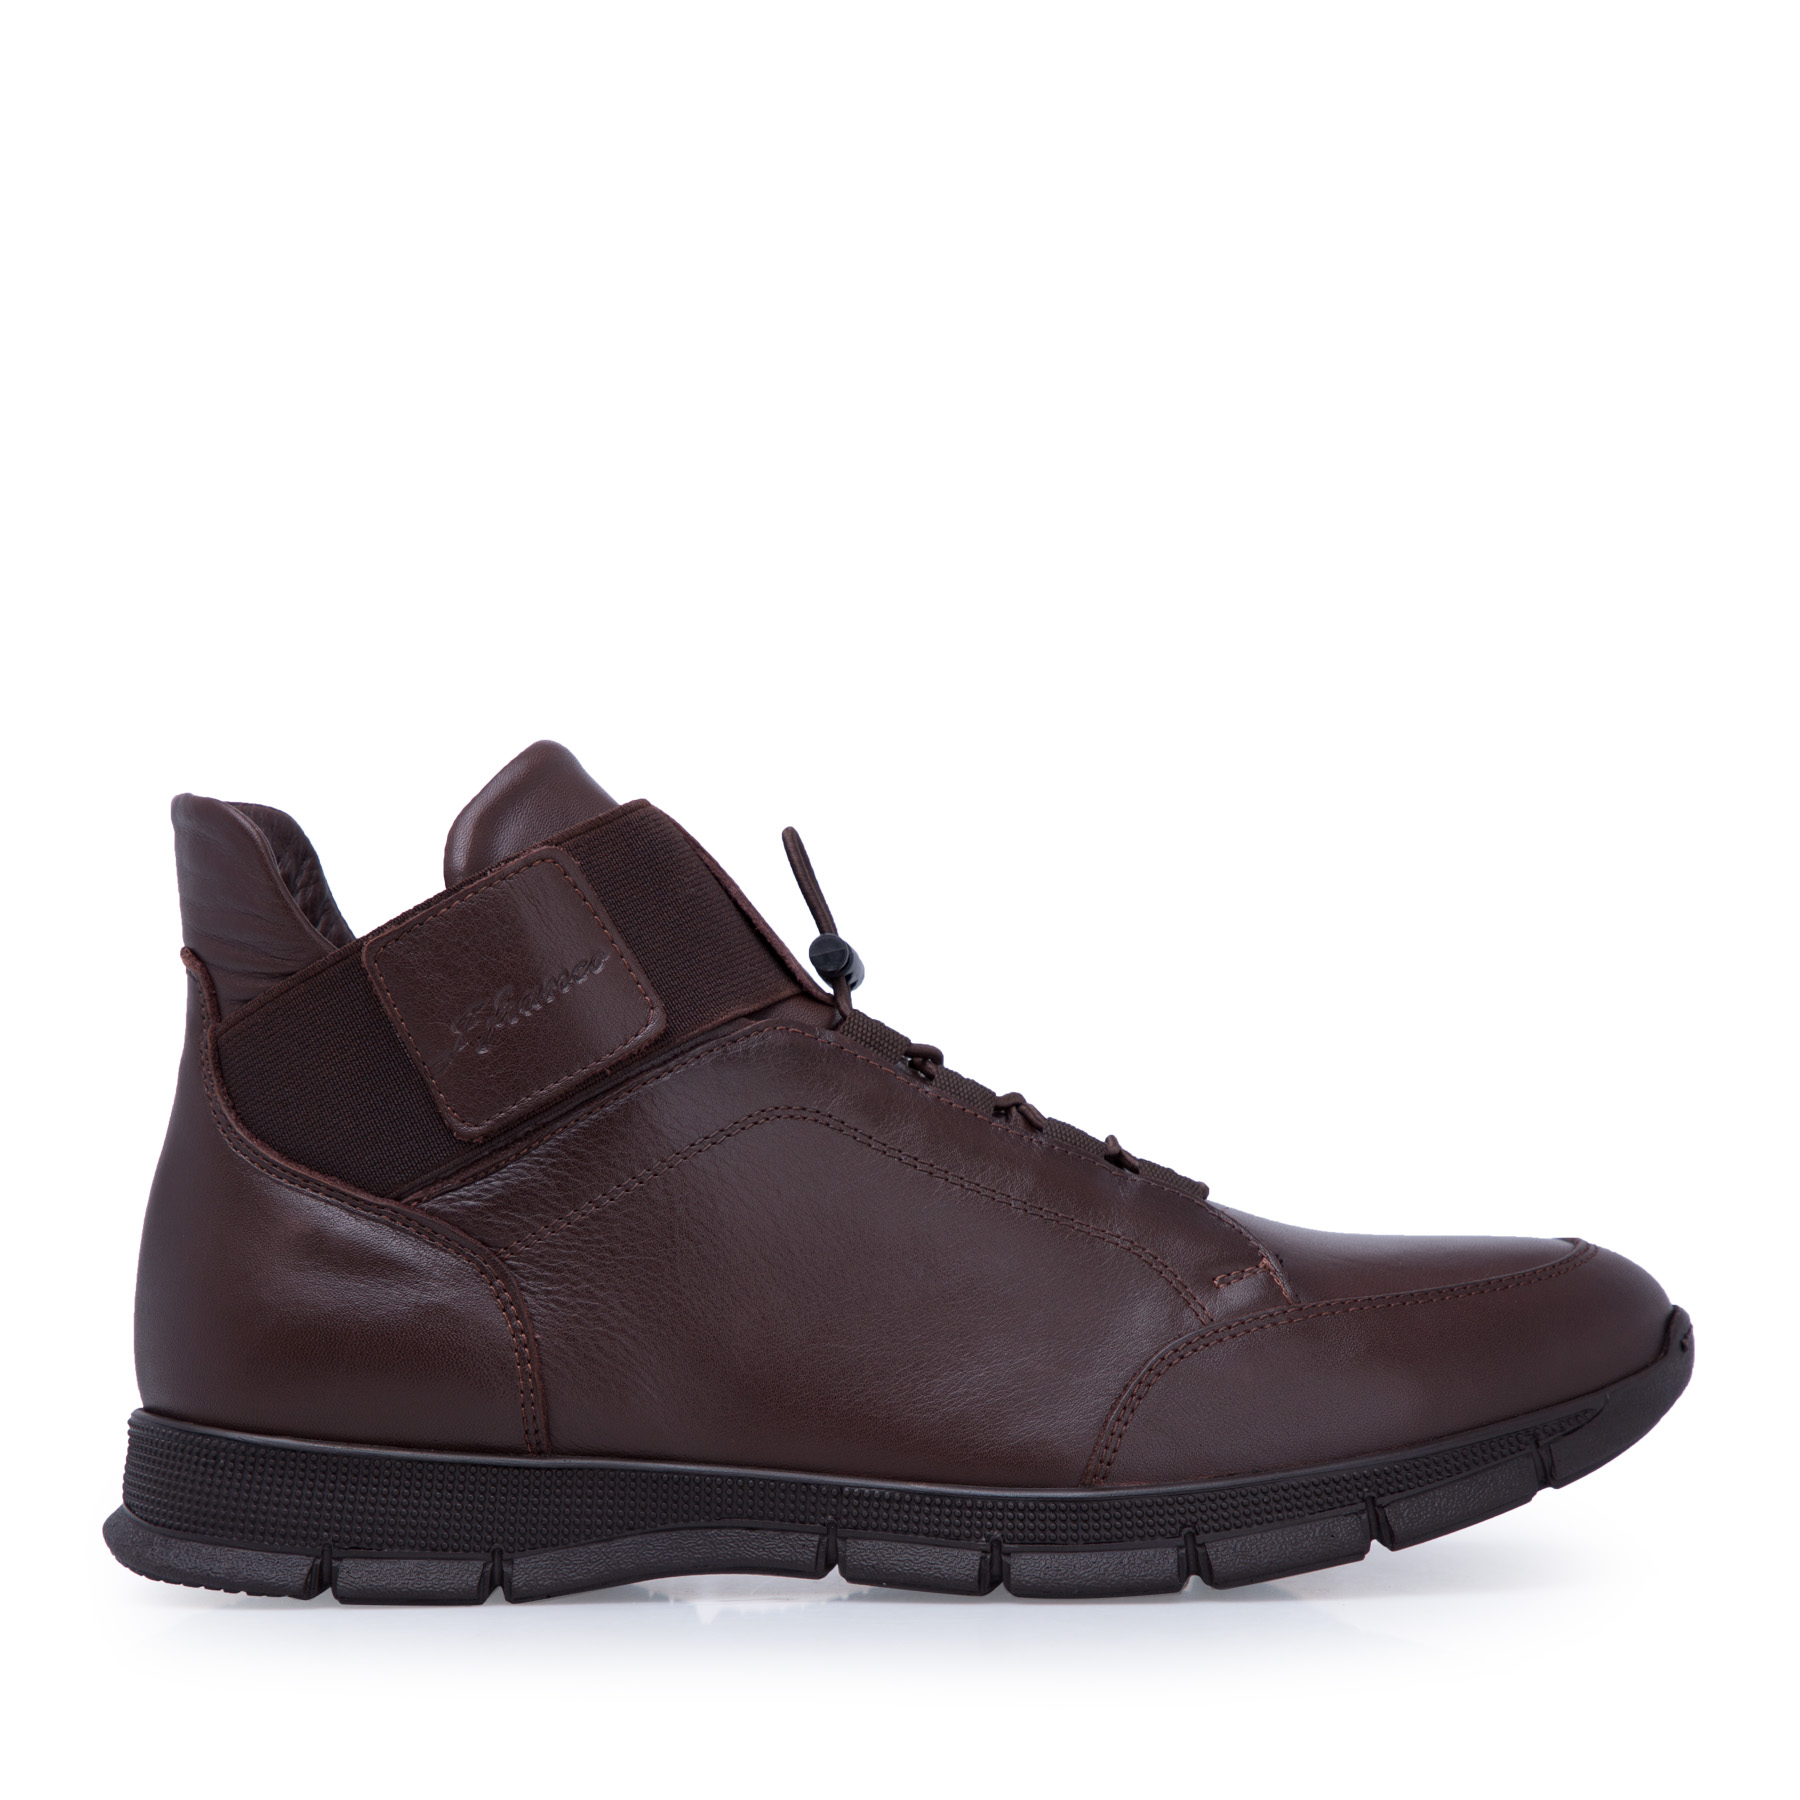 James & Franco Leather Boots MEN 'S BOOTS 5405290T